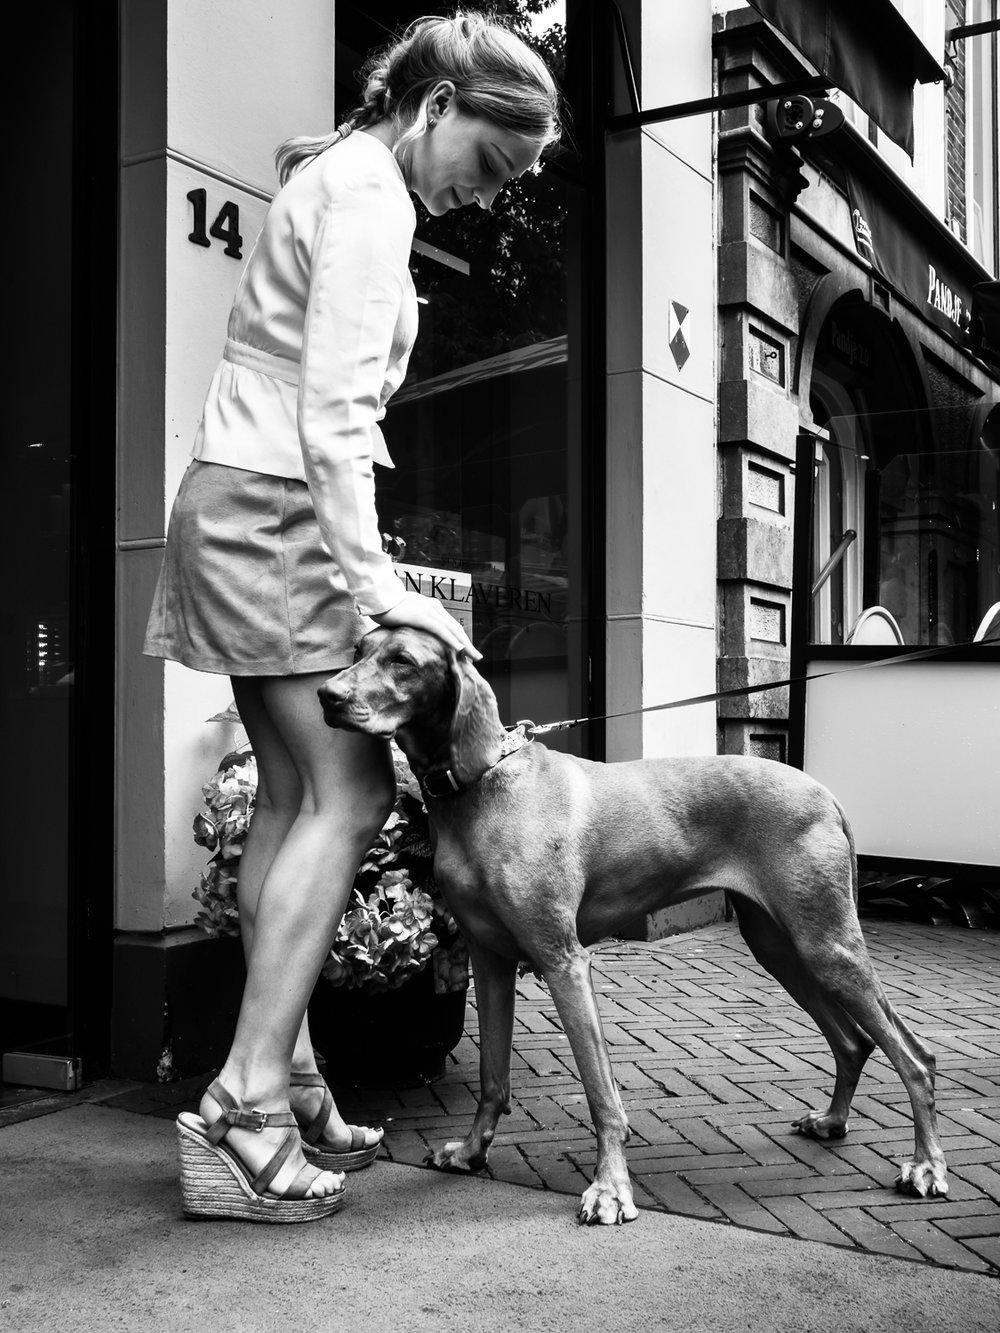 fokko muller street photography - 170729 - 001.jpg